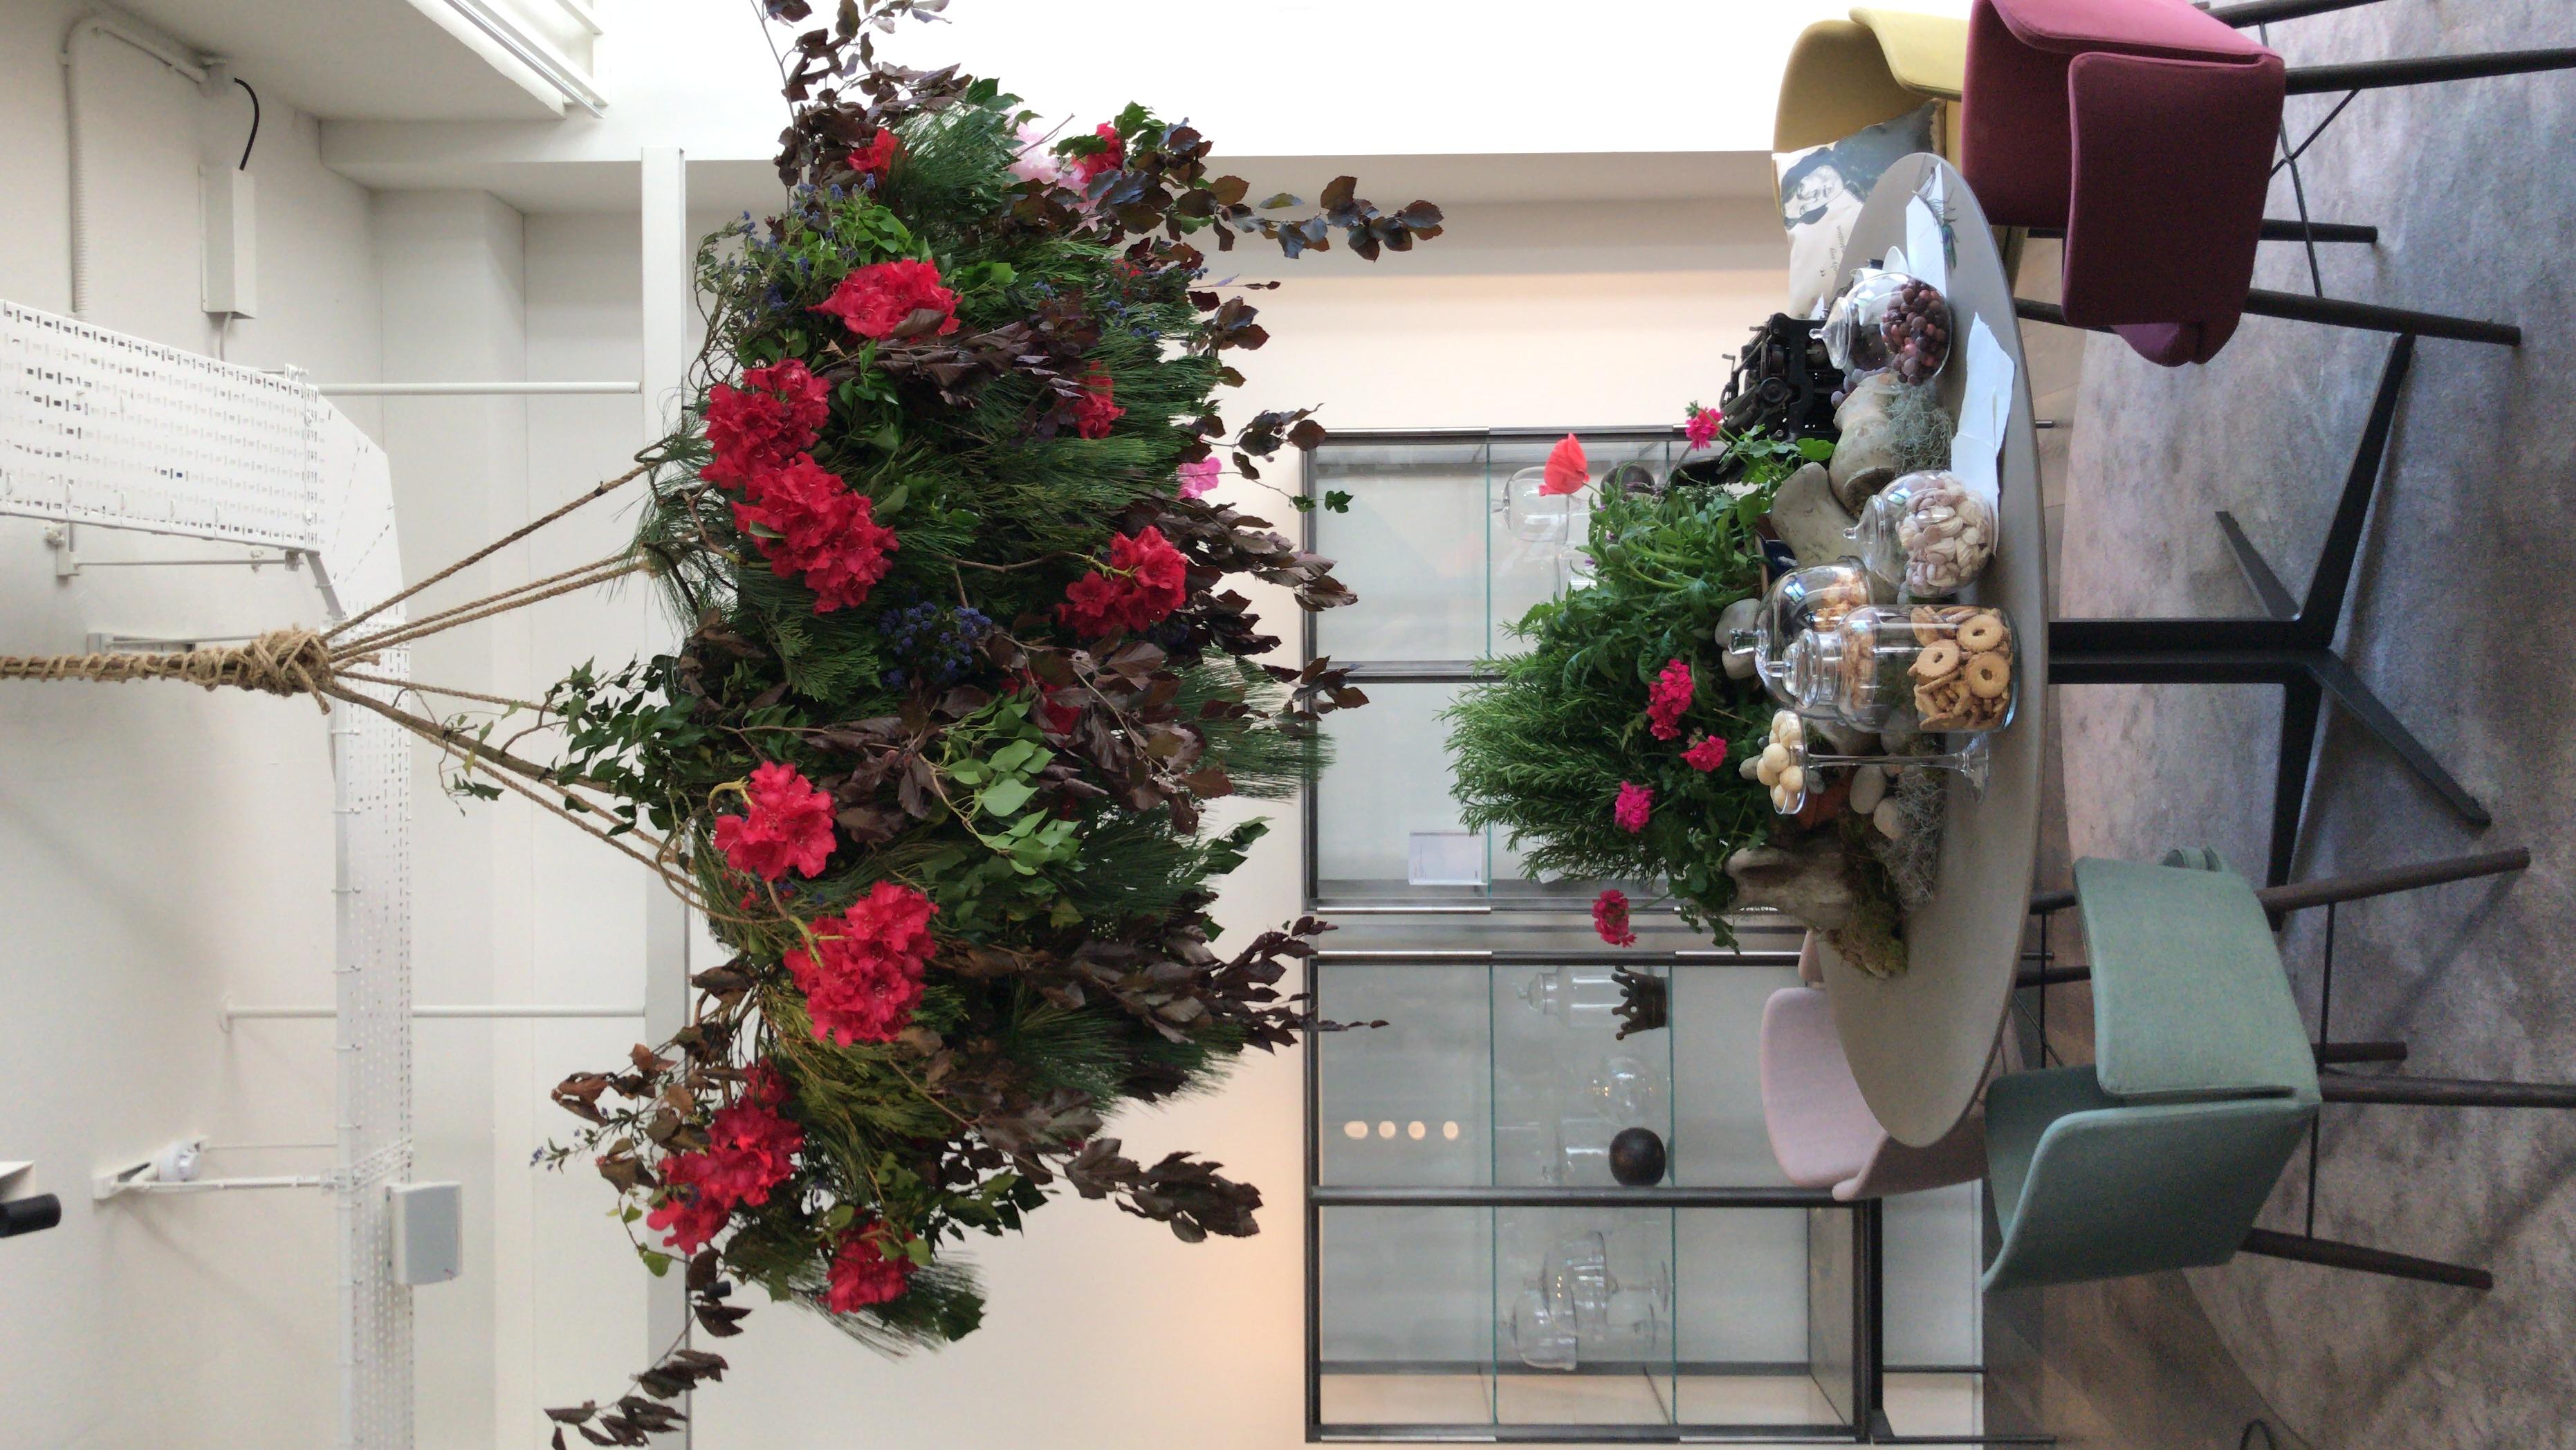 Lema-Chelsea flower show